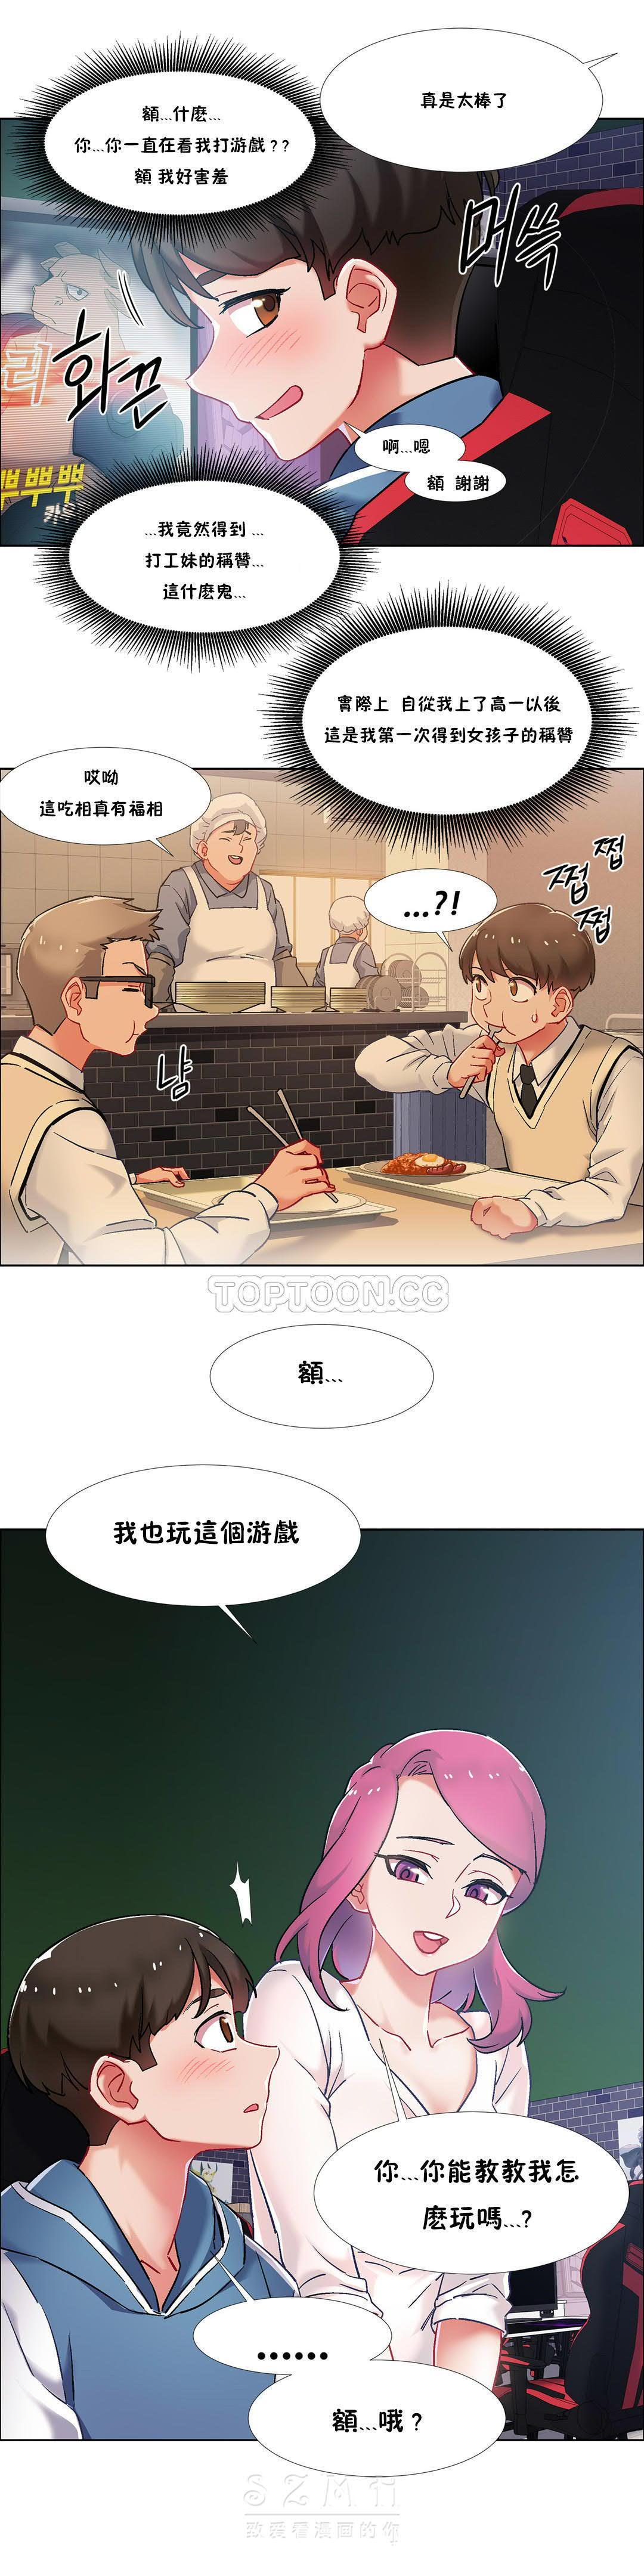 [Studio Wannabe] Rental Girls | 出租女郎 Ch. 33-58 [Chinese]  第二季 完结 19